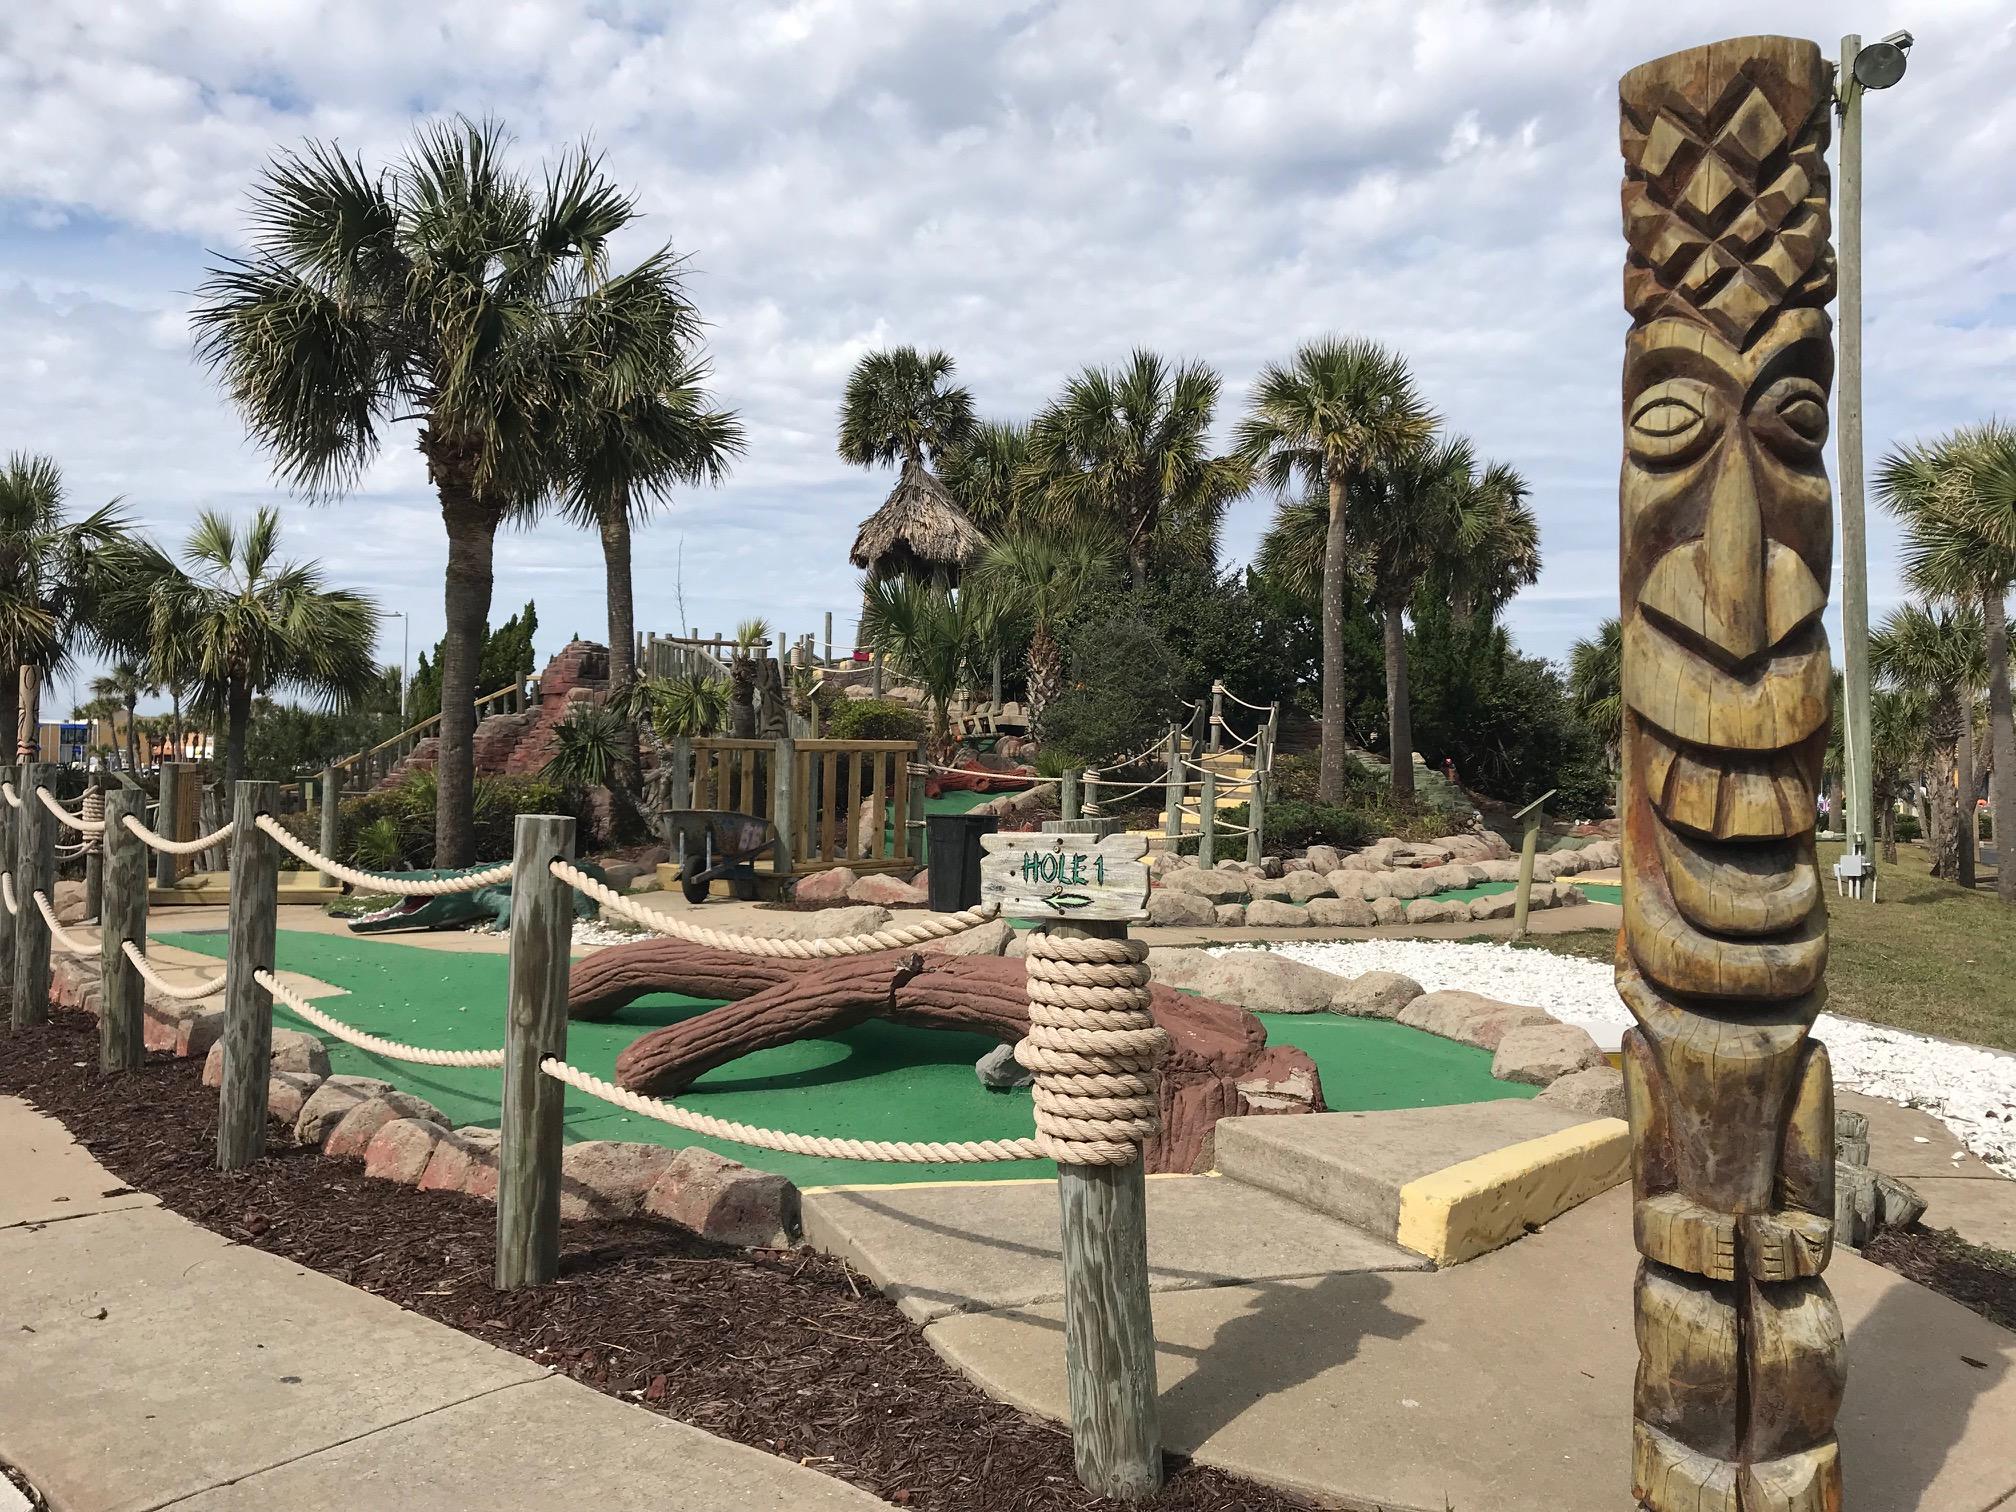 Emerald Isle #1105 Condo rental in Emerald Isle Pensacola Beach in Pensacola Beach Florida - #44